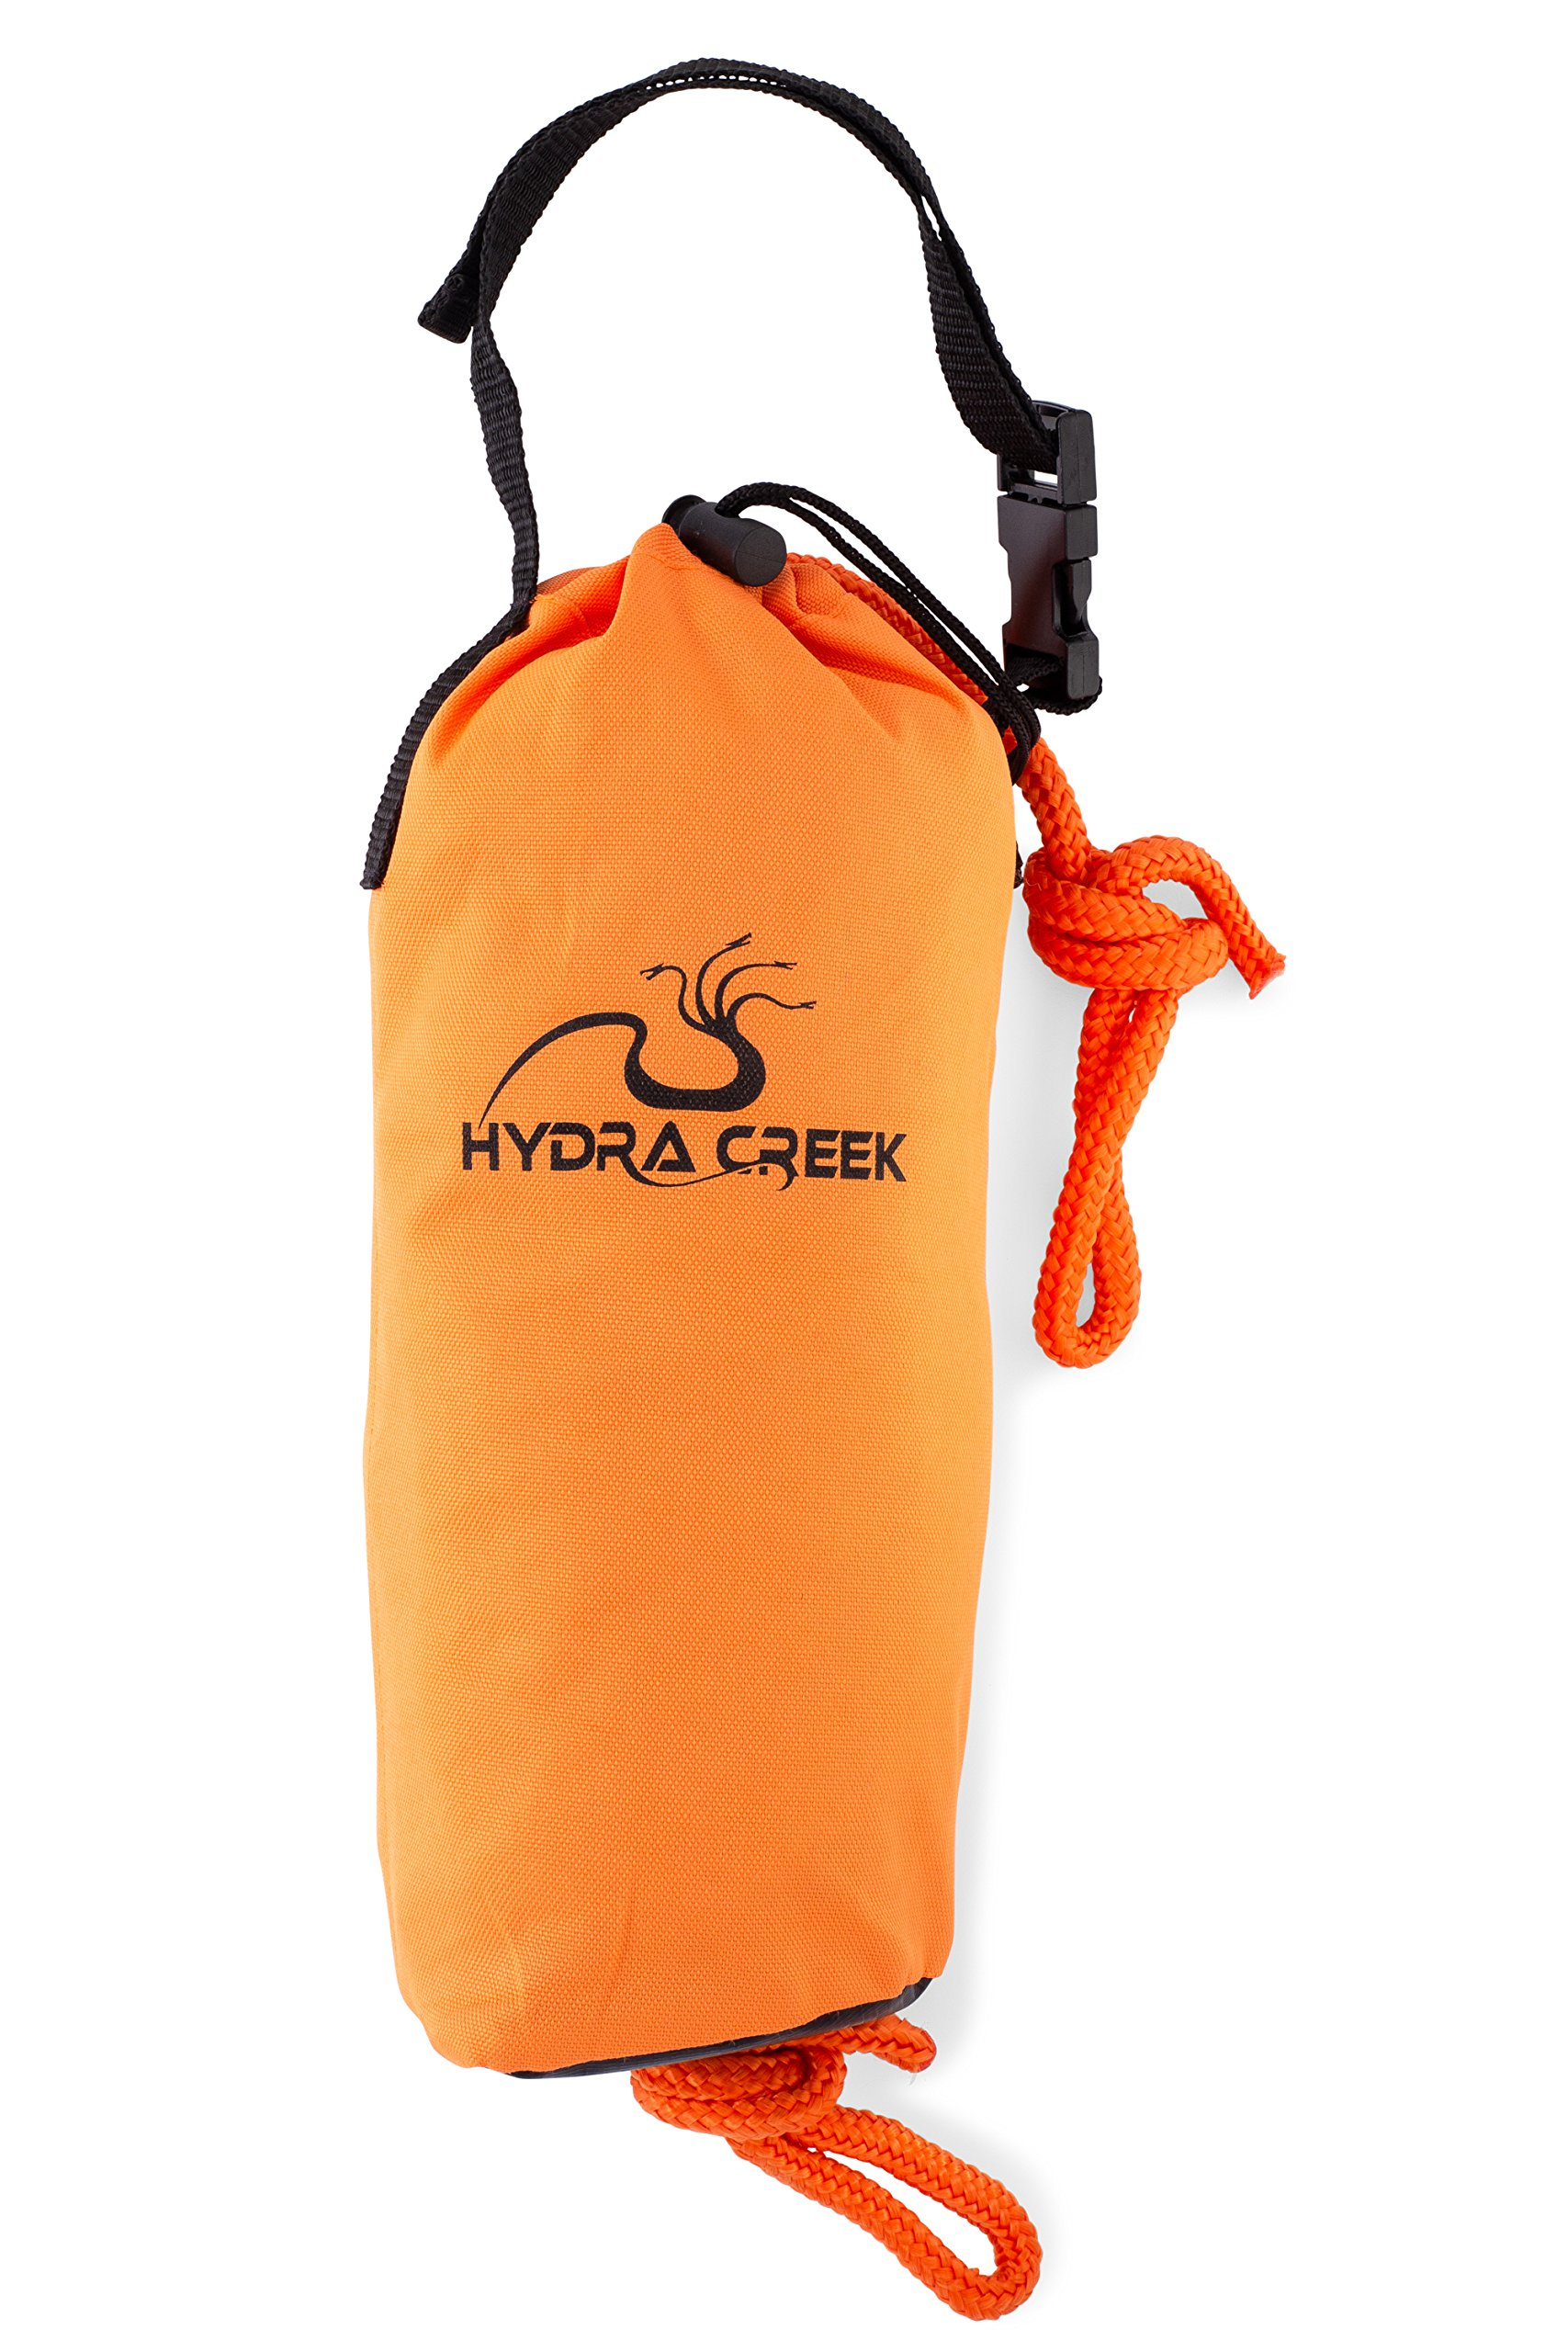 Hydra Creek Rescue Throw Bag, 70 feet, 3/8 inch rope, Floating by Hydra Creek (Image #1)